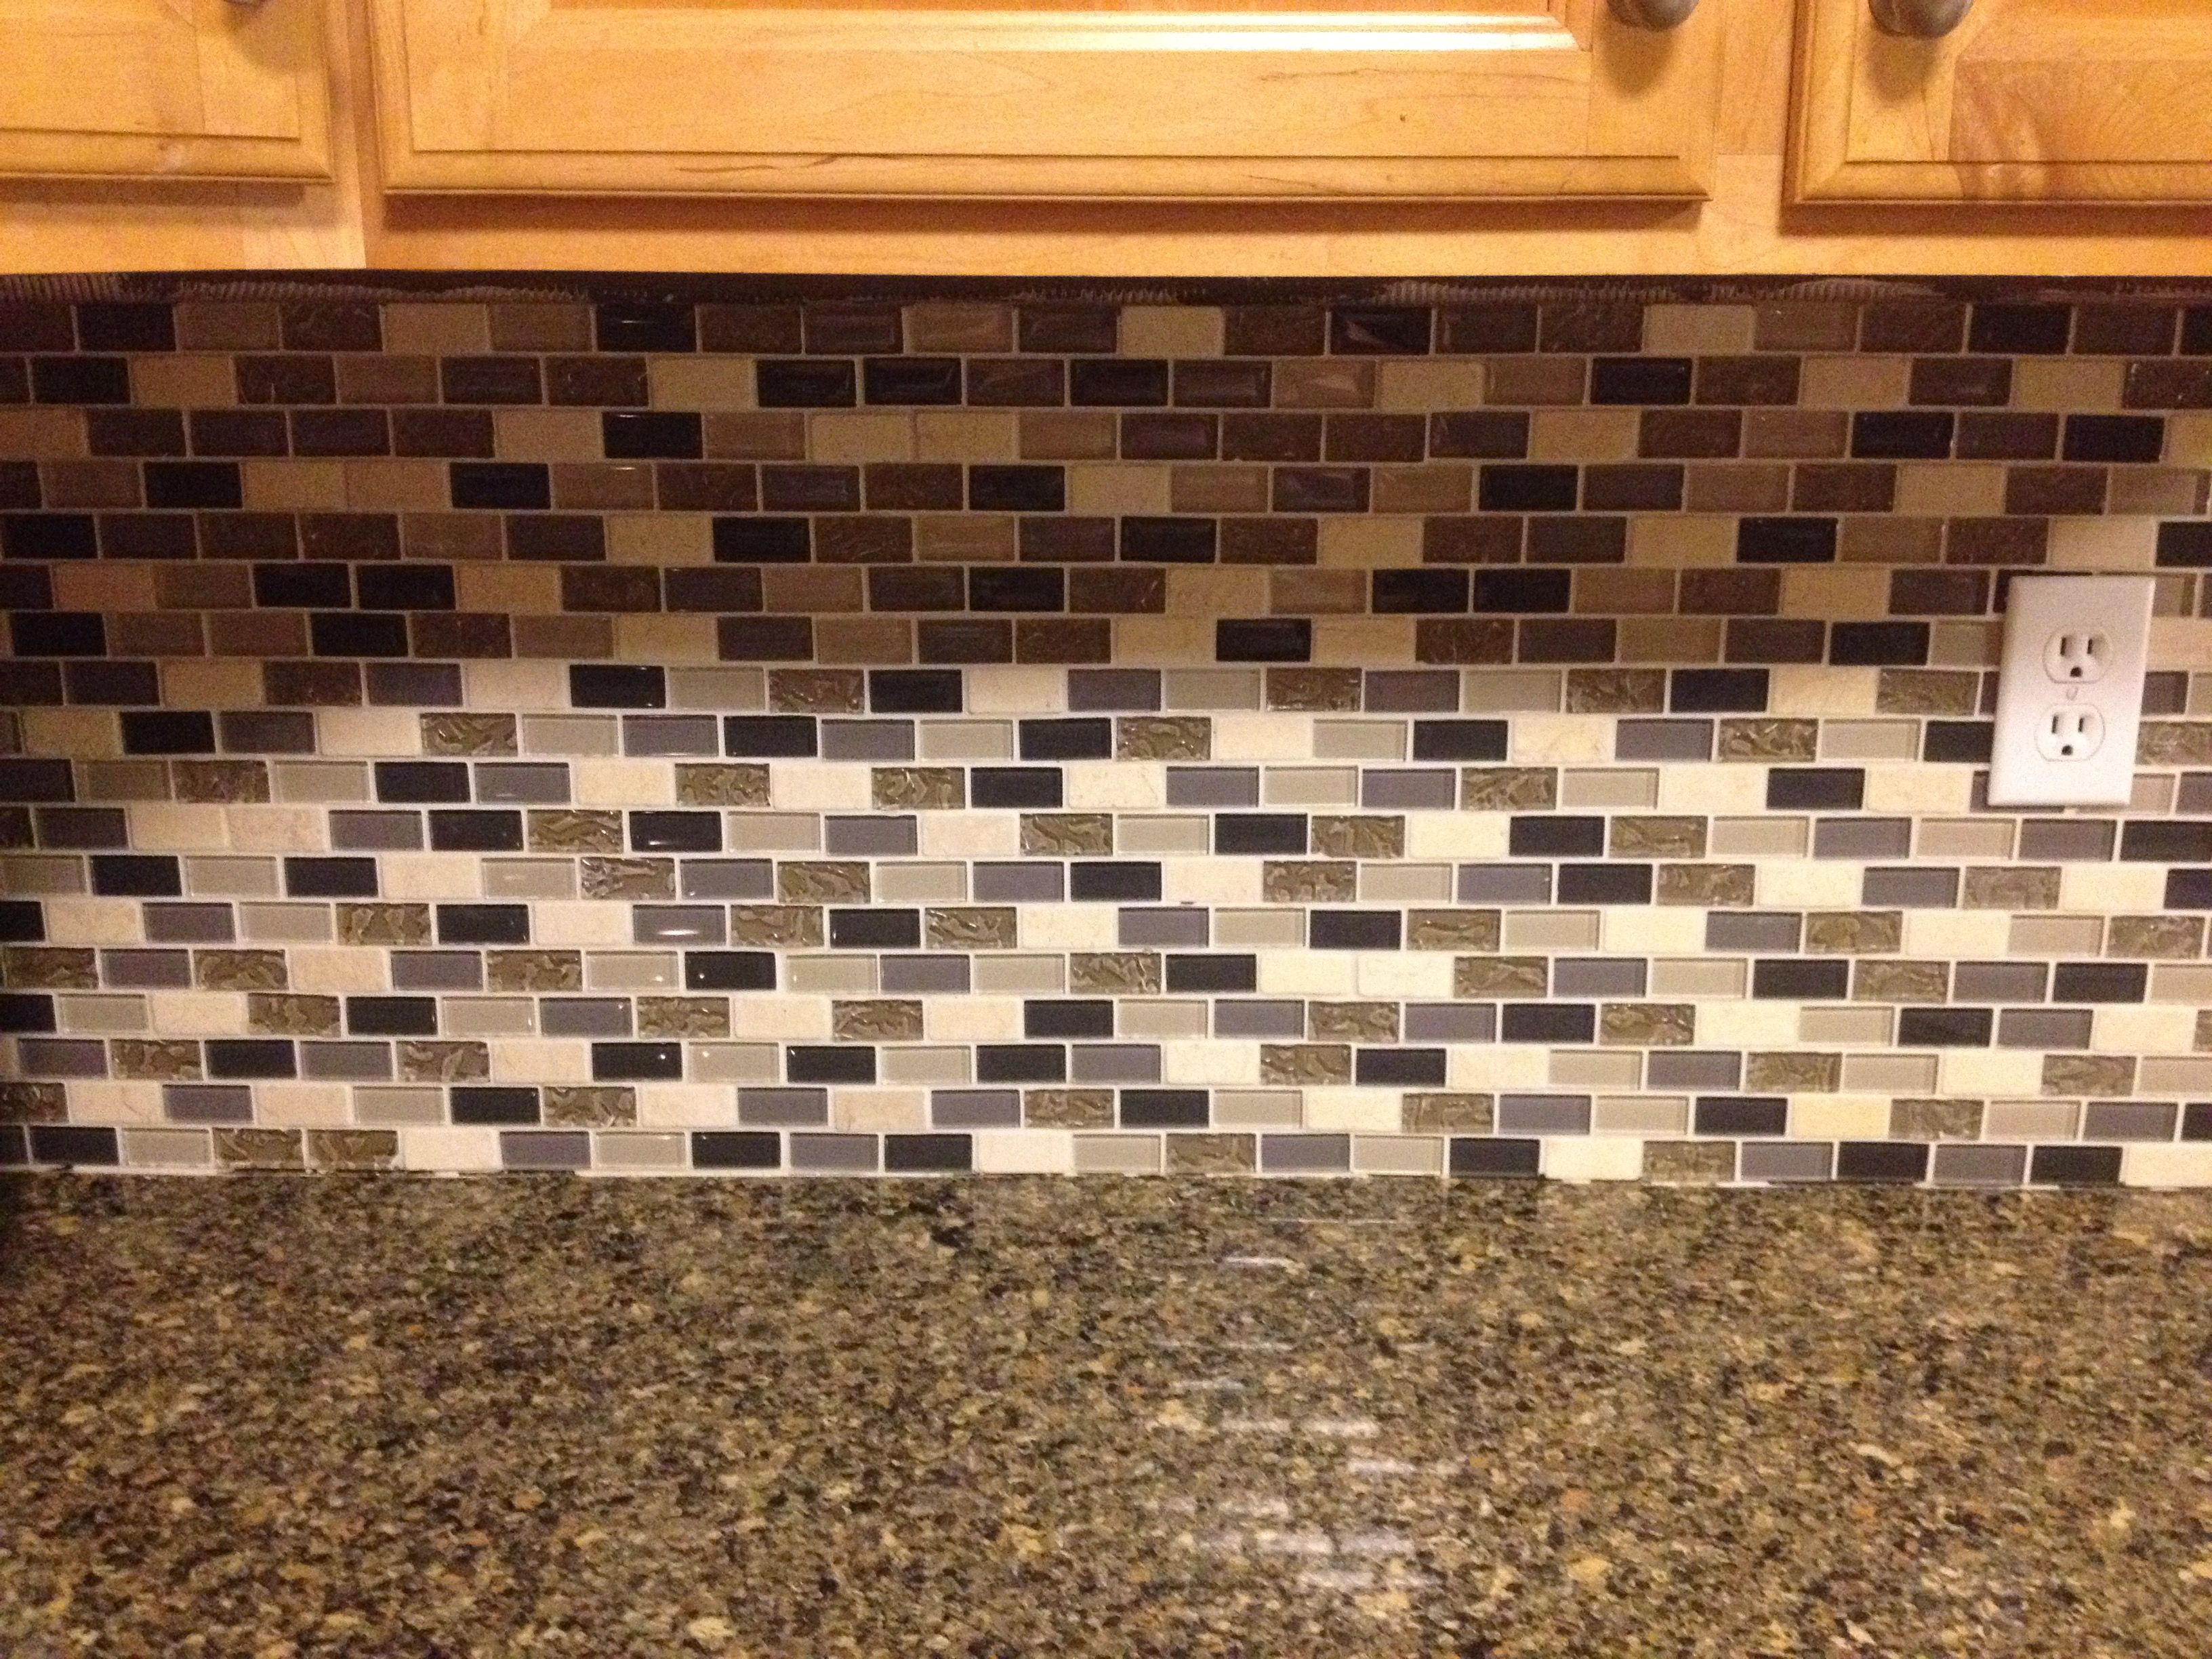 Cedar Cove Mosaic Mosaic Tile Mosaic Tiles Kitchen Backslash Tile Floor